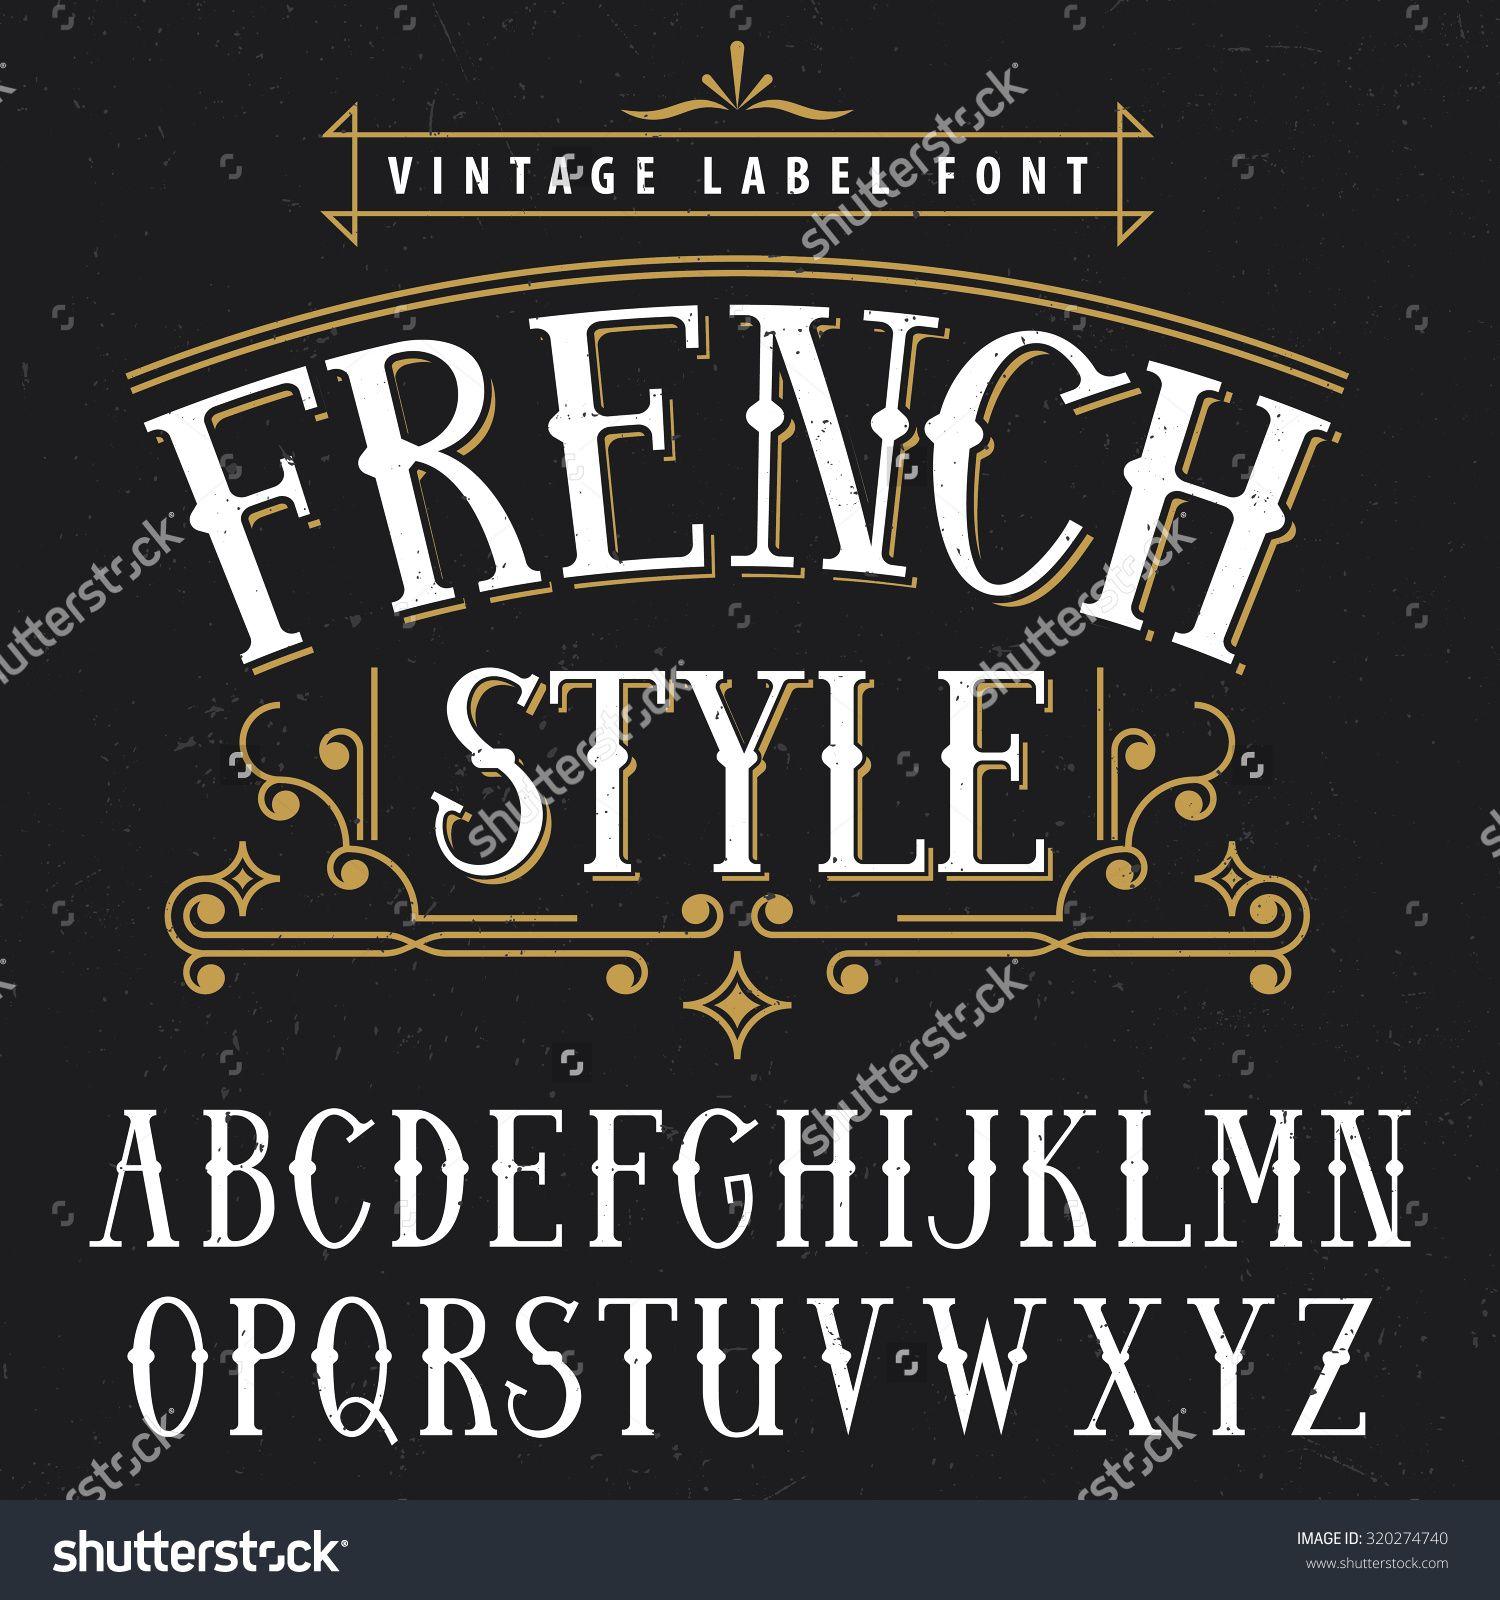 French Style Vintage Label Font. Vector Illustration